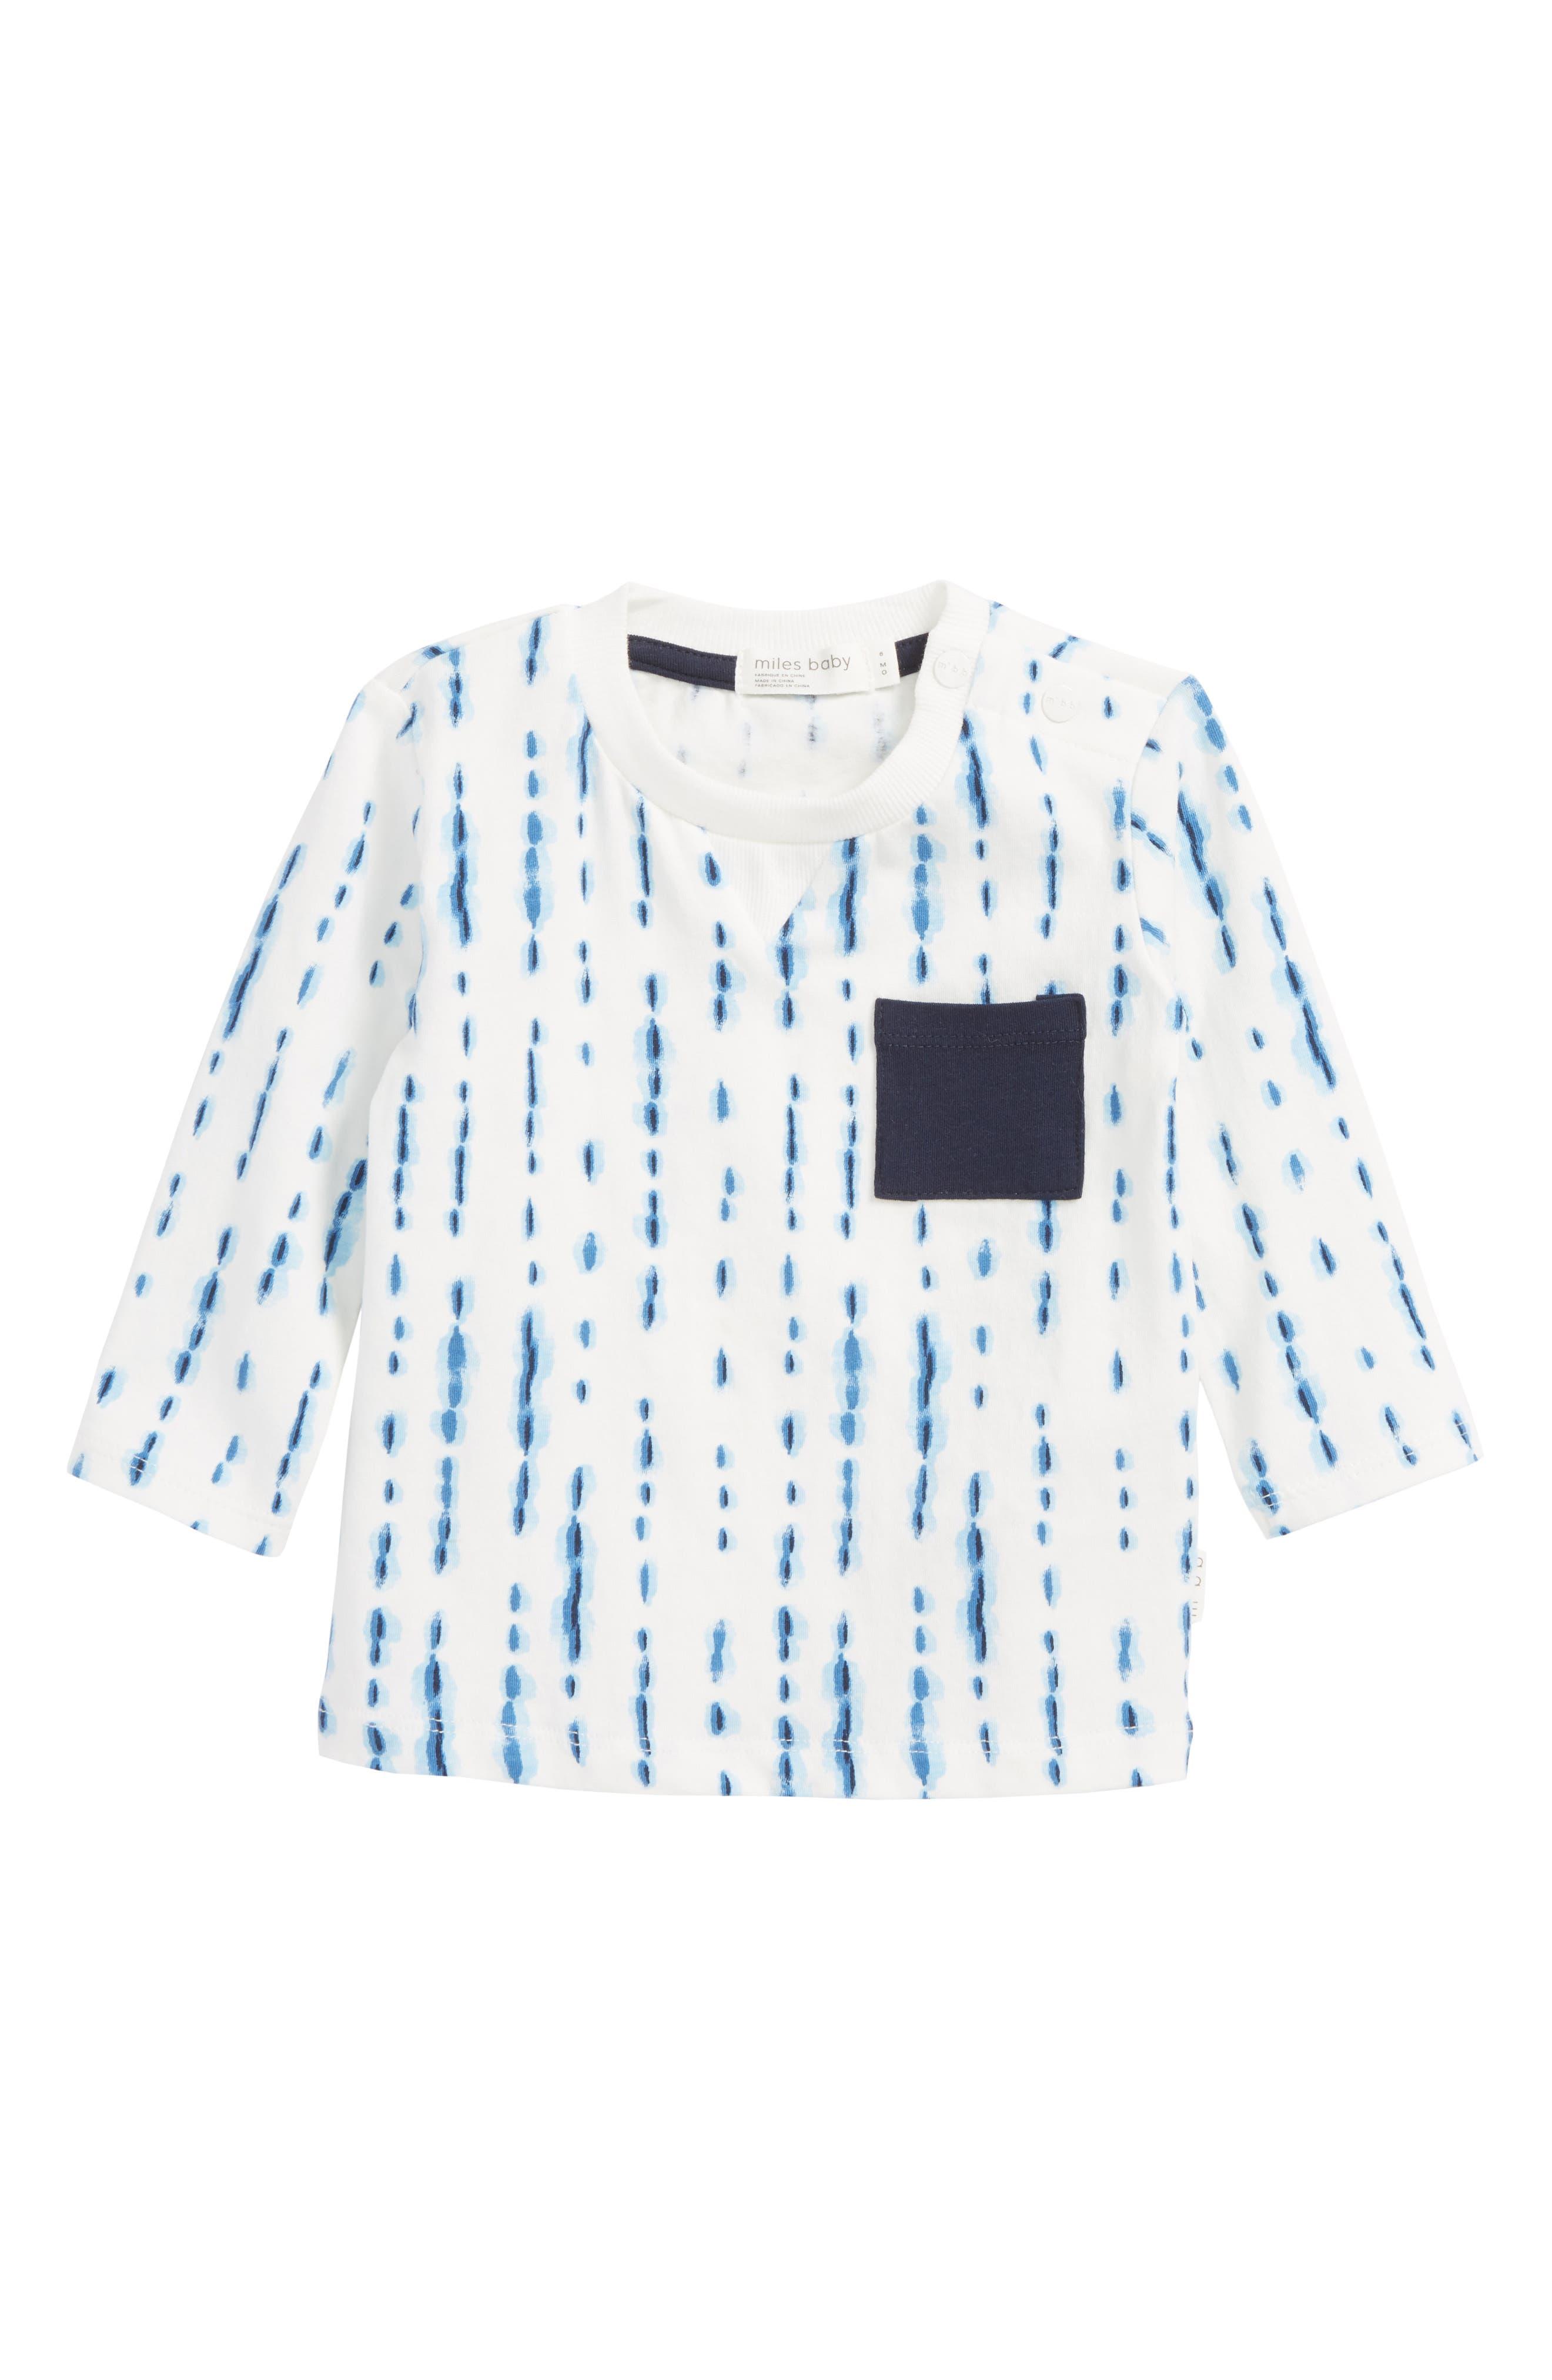 Main Image - Miles Baby Pocket T-Shirt (Baby Boys)